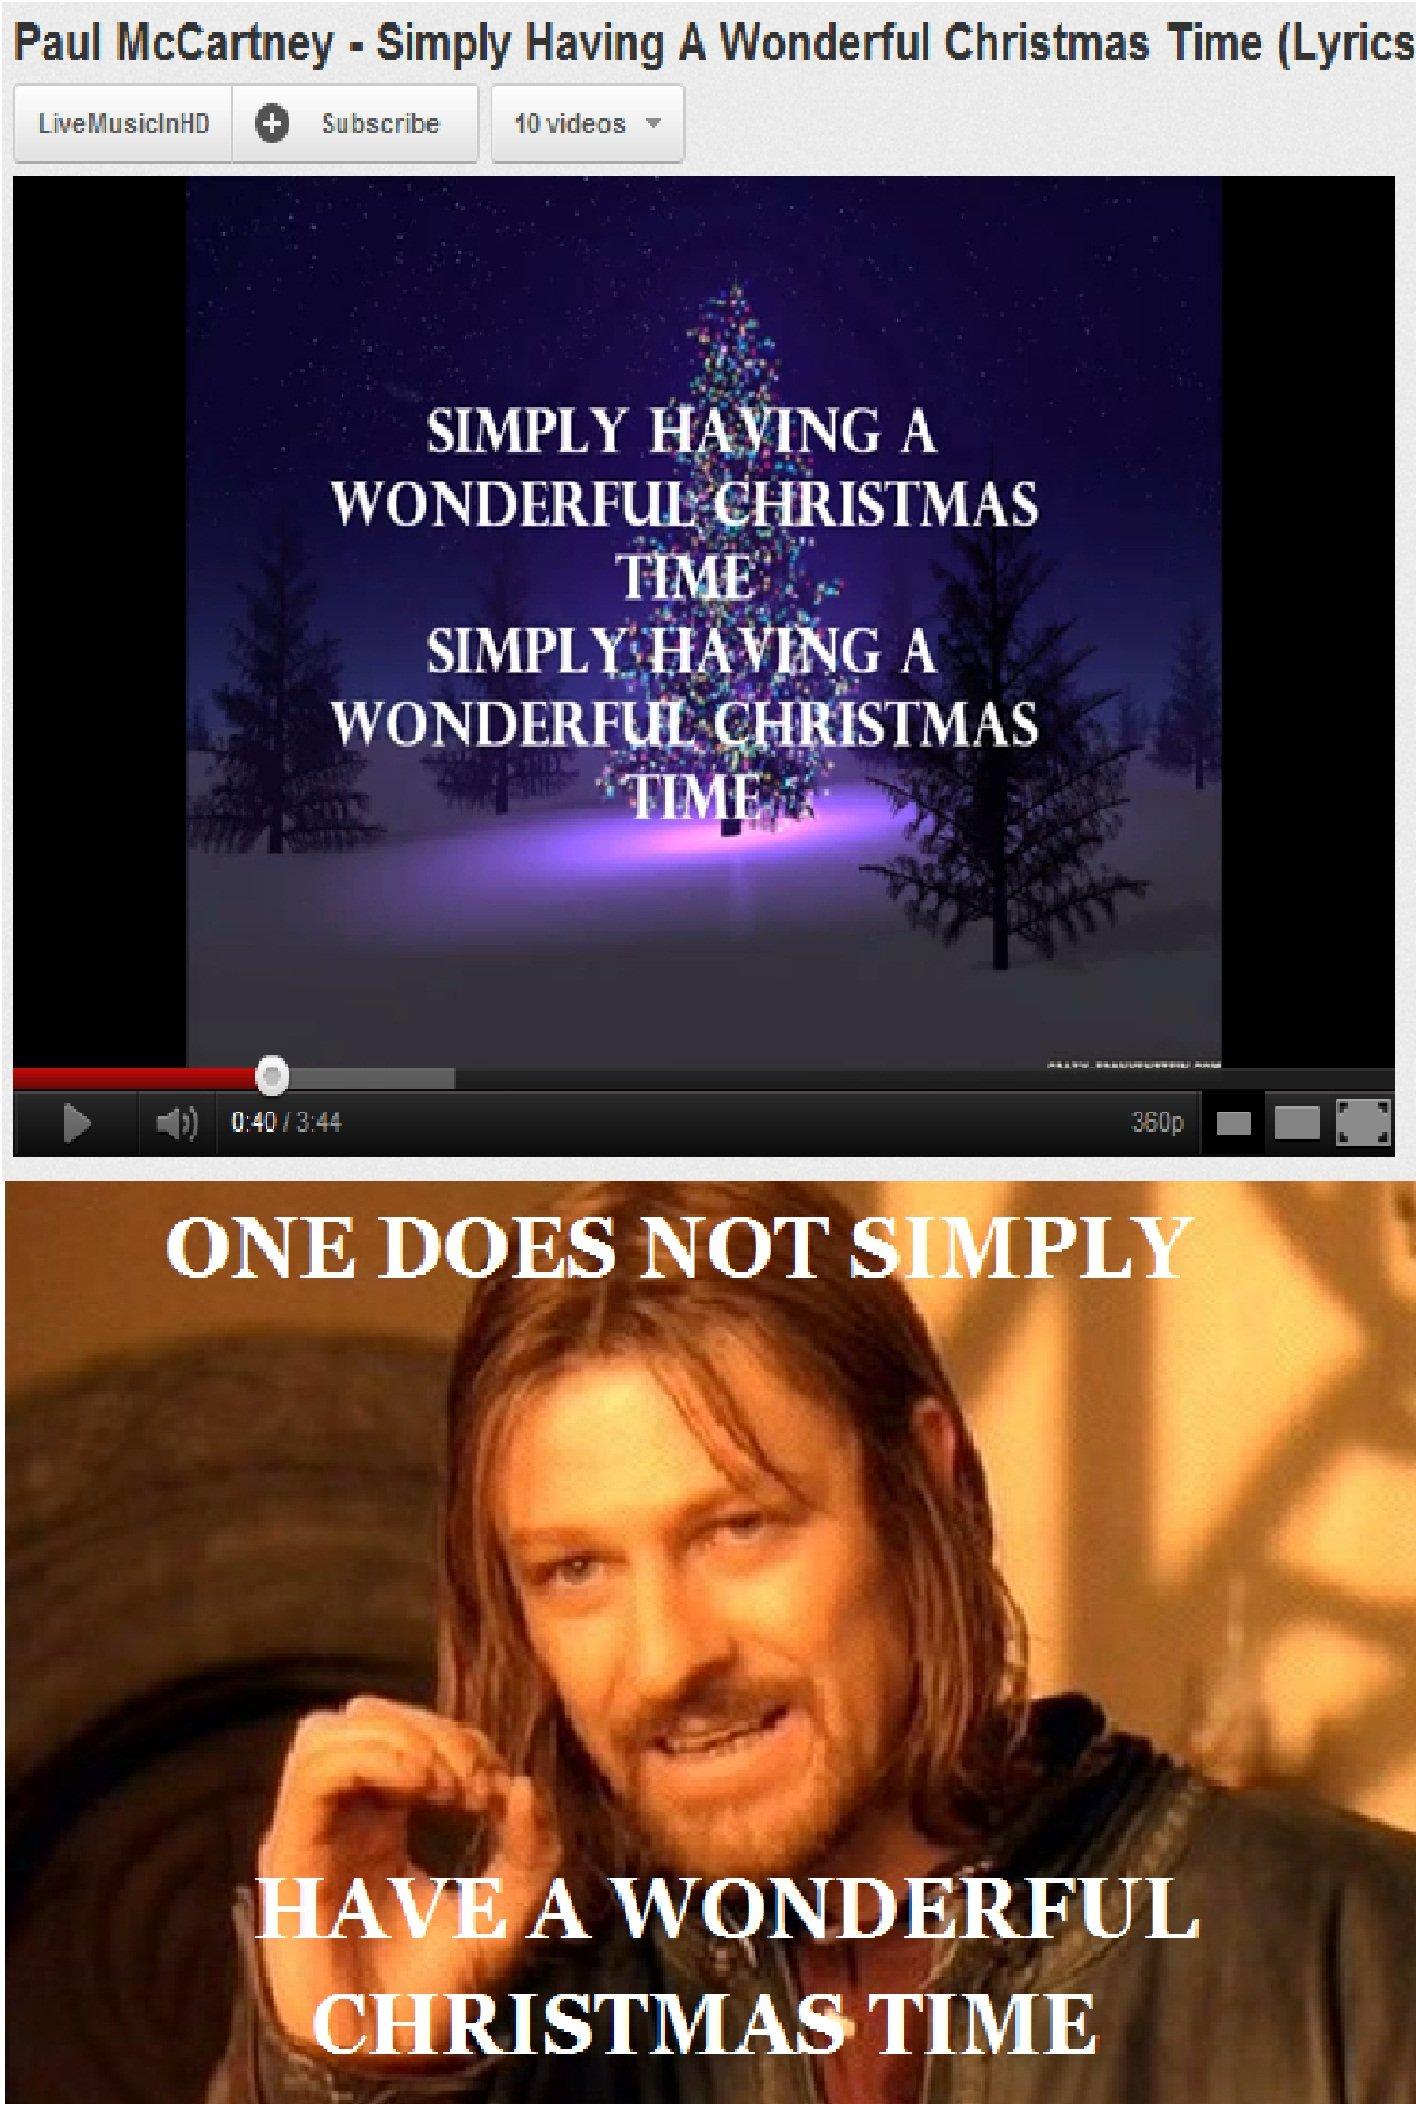 2cdb89_3038147jpg - Simply Having A Wonderful Christmas Time Lyrics